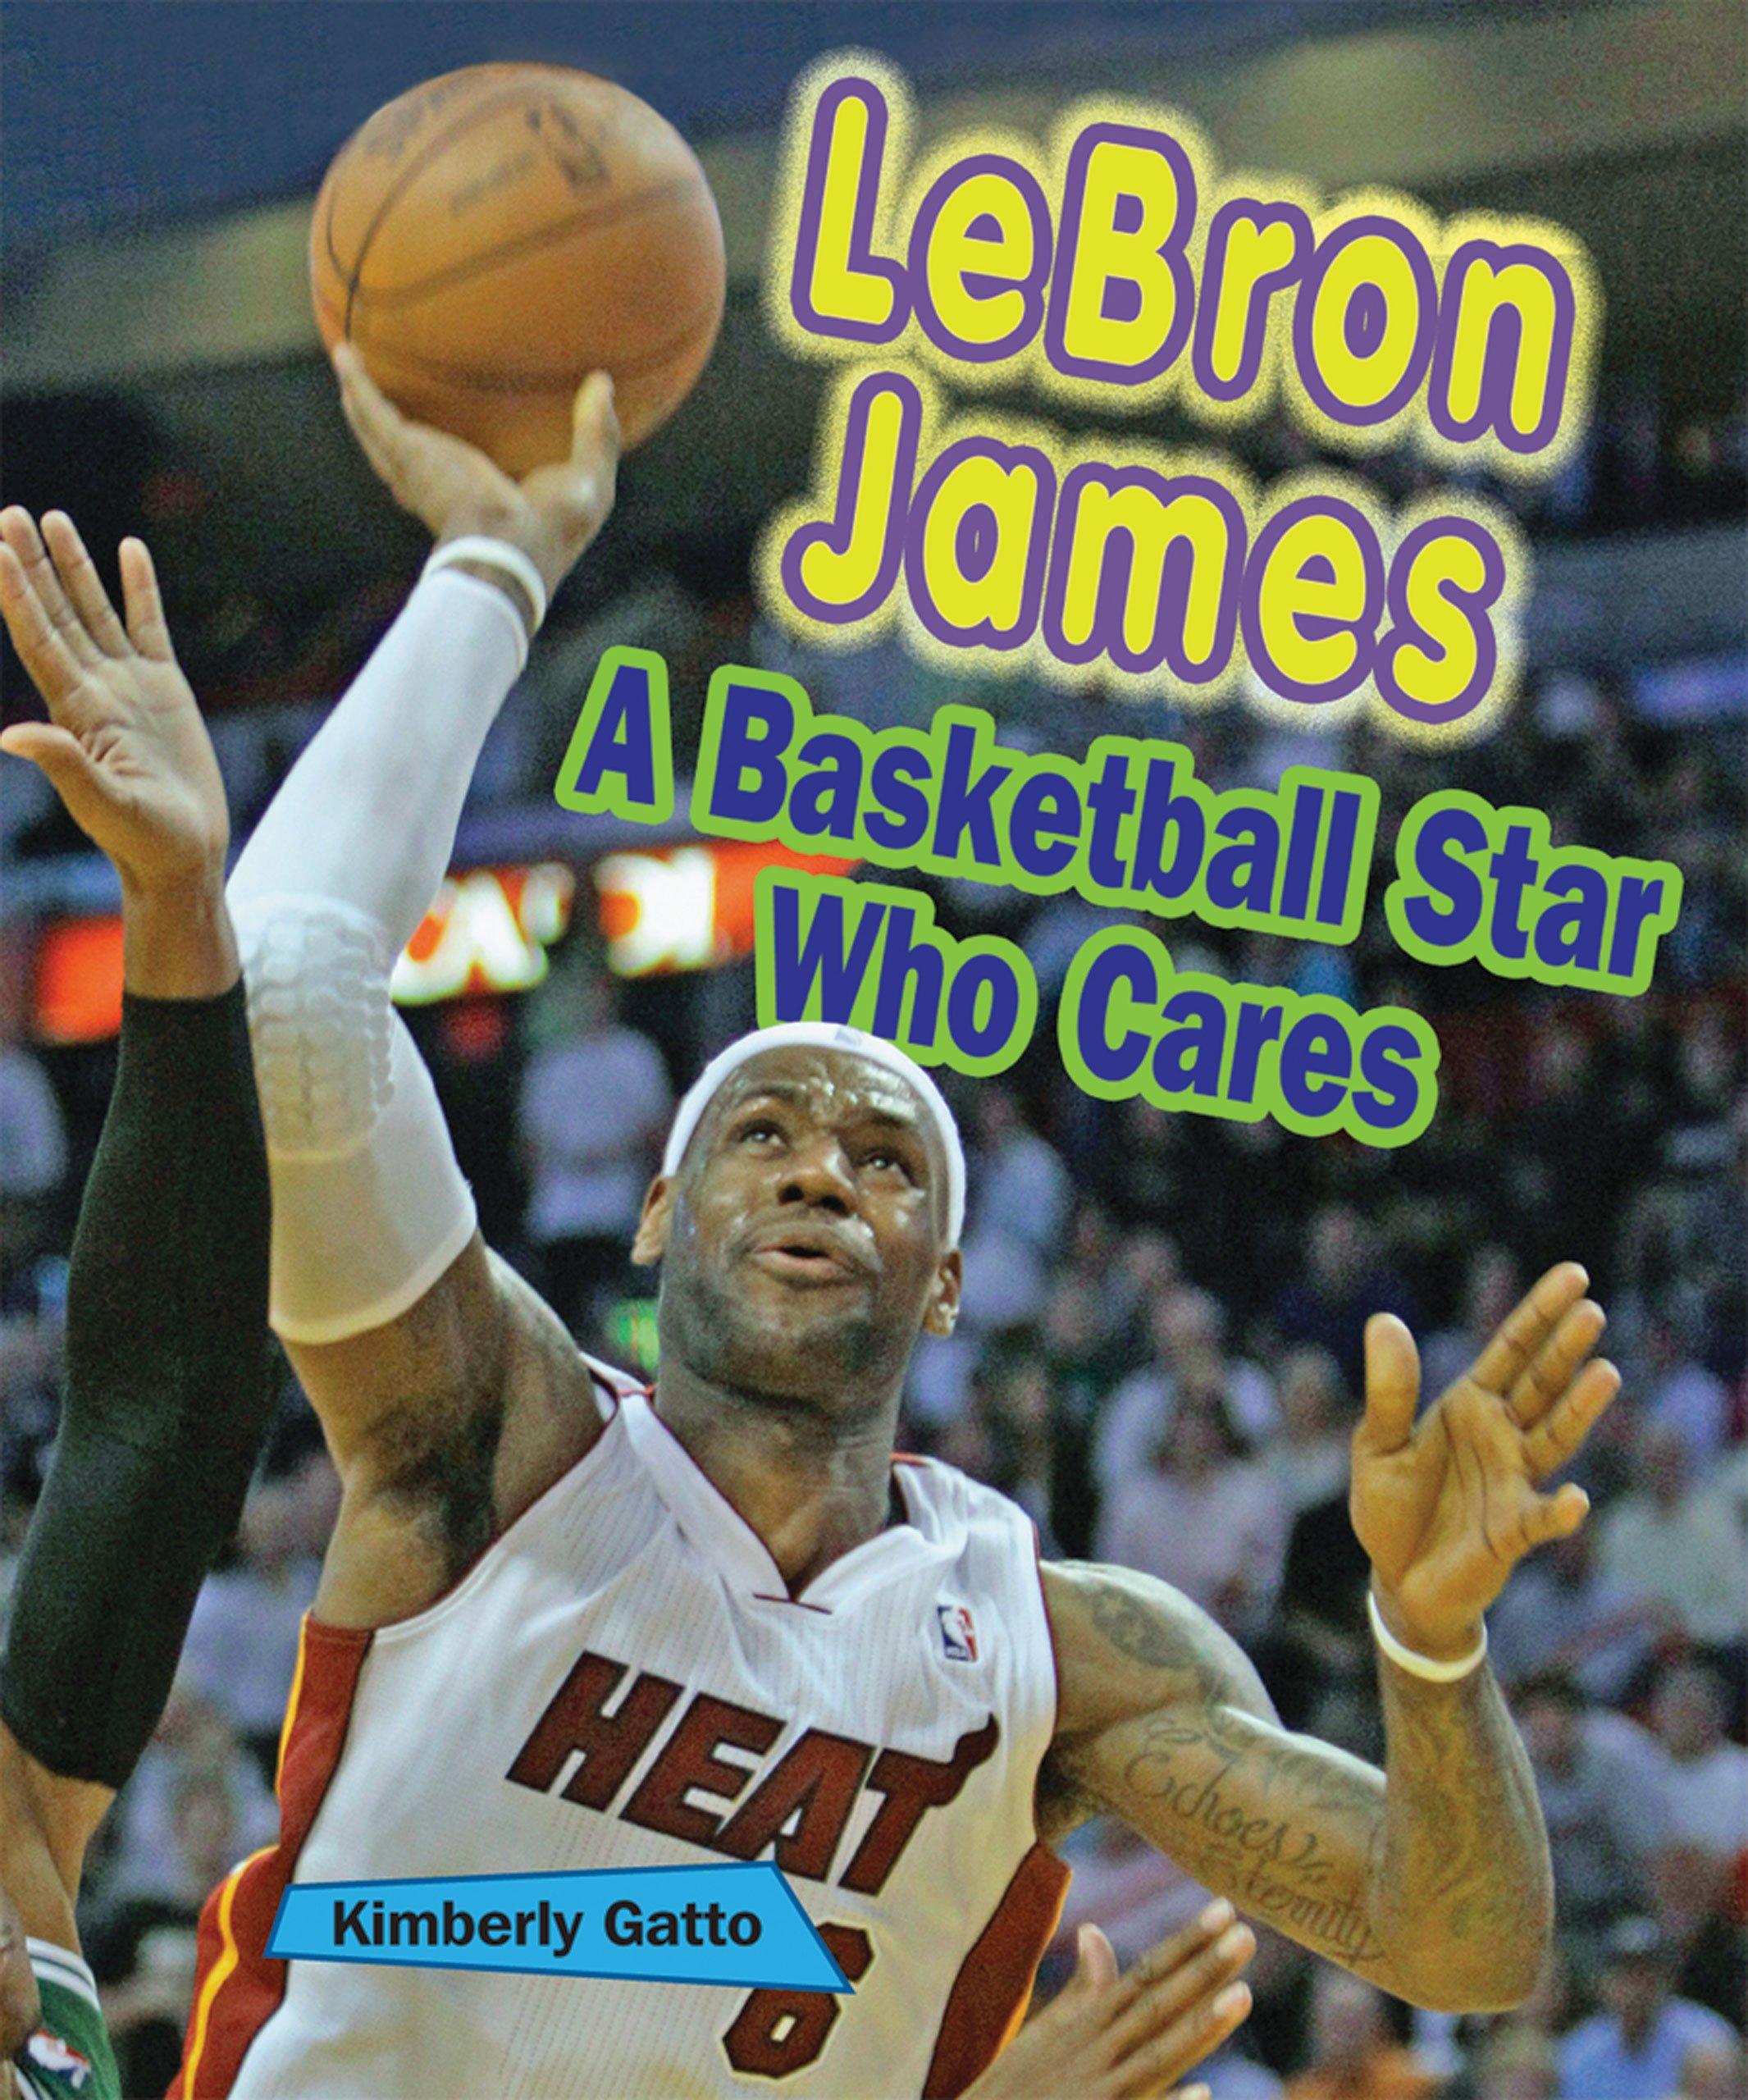 Lebron James: A Basketball Star Who Cares (Sports Stars Who Care) PDF